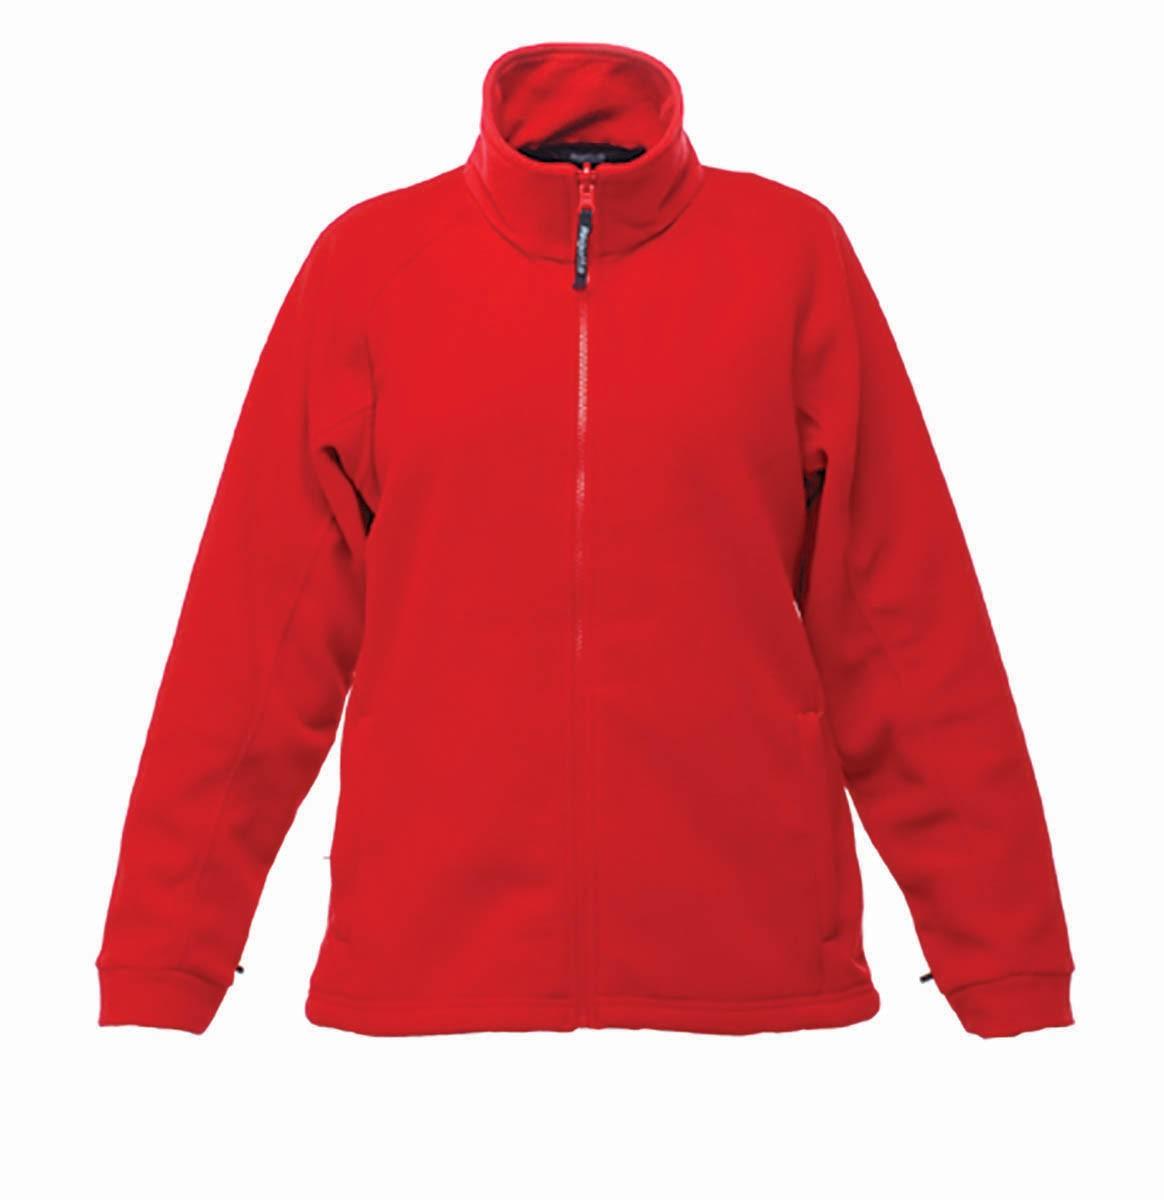 Regatta Ladies Thor III Fleece Jacket TRF541 Pink